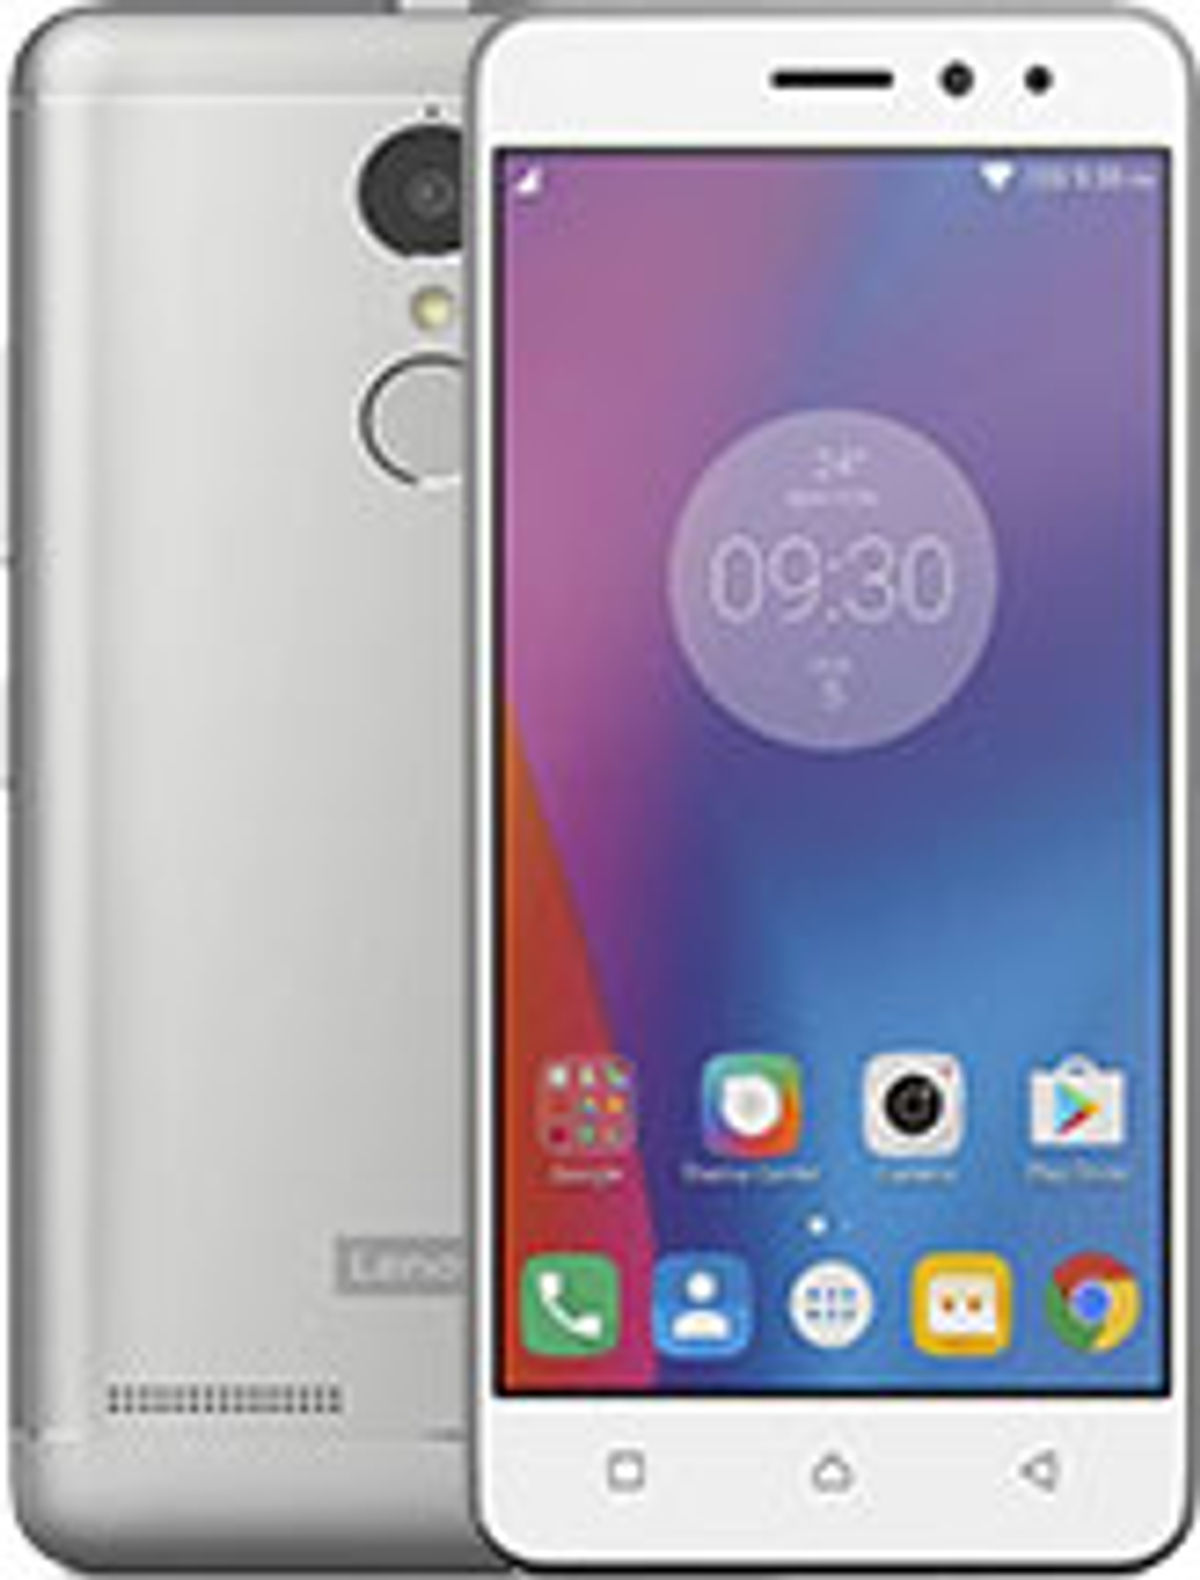 Best Mobile Phones Under 10000 in India - September 2019